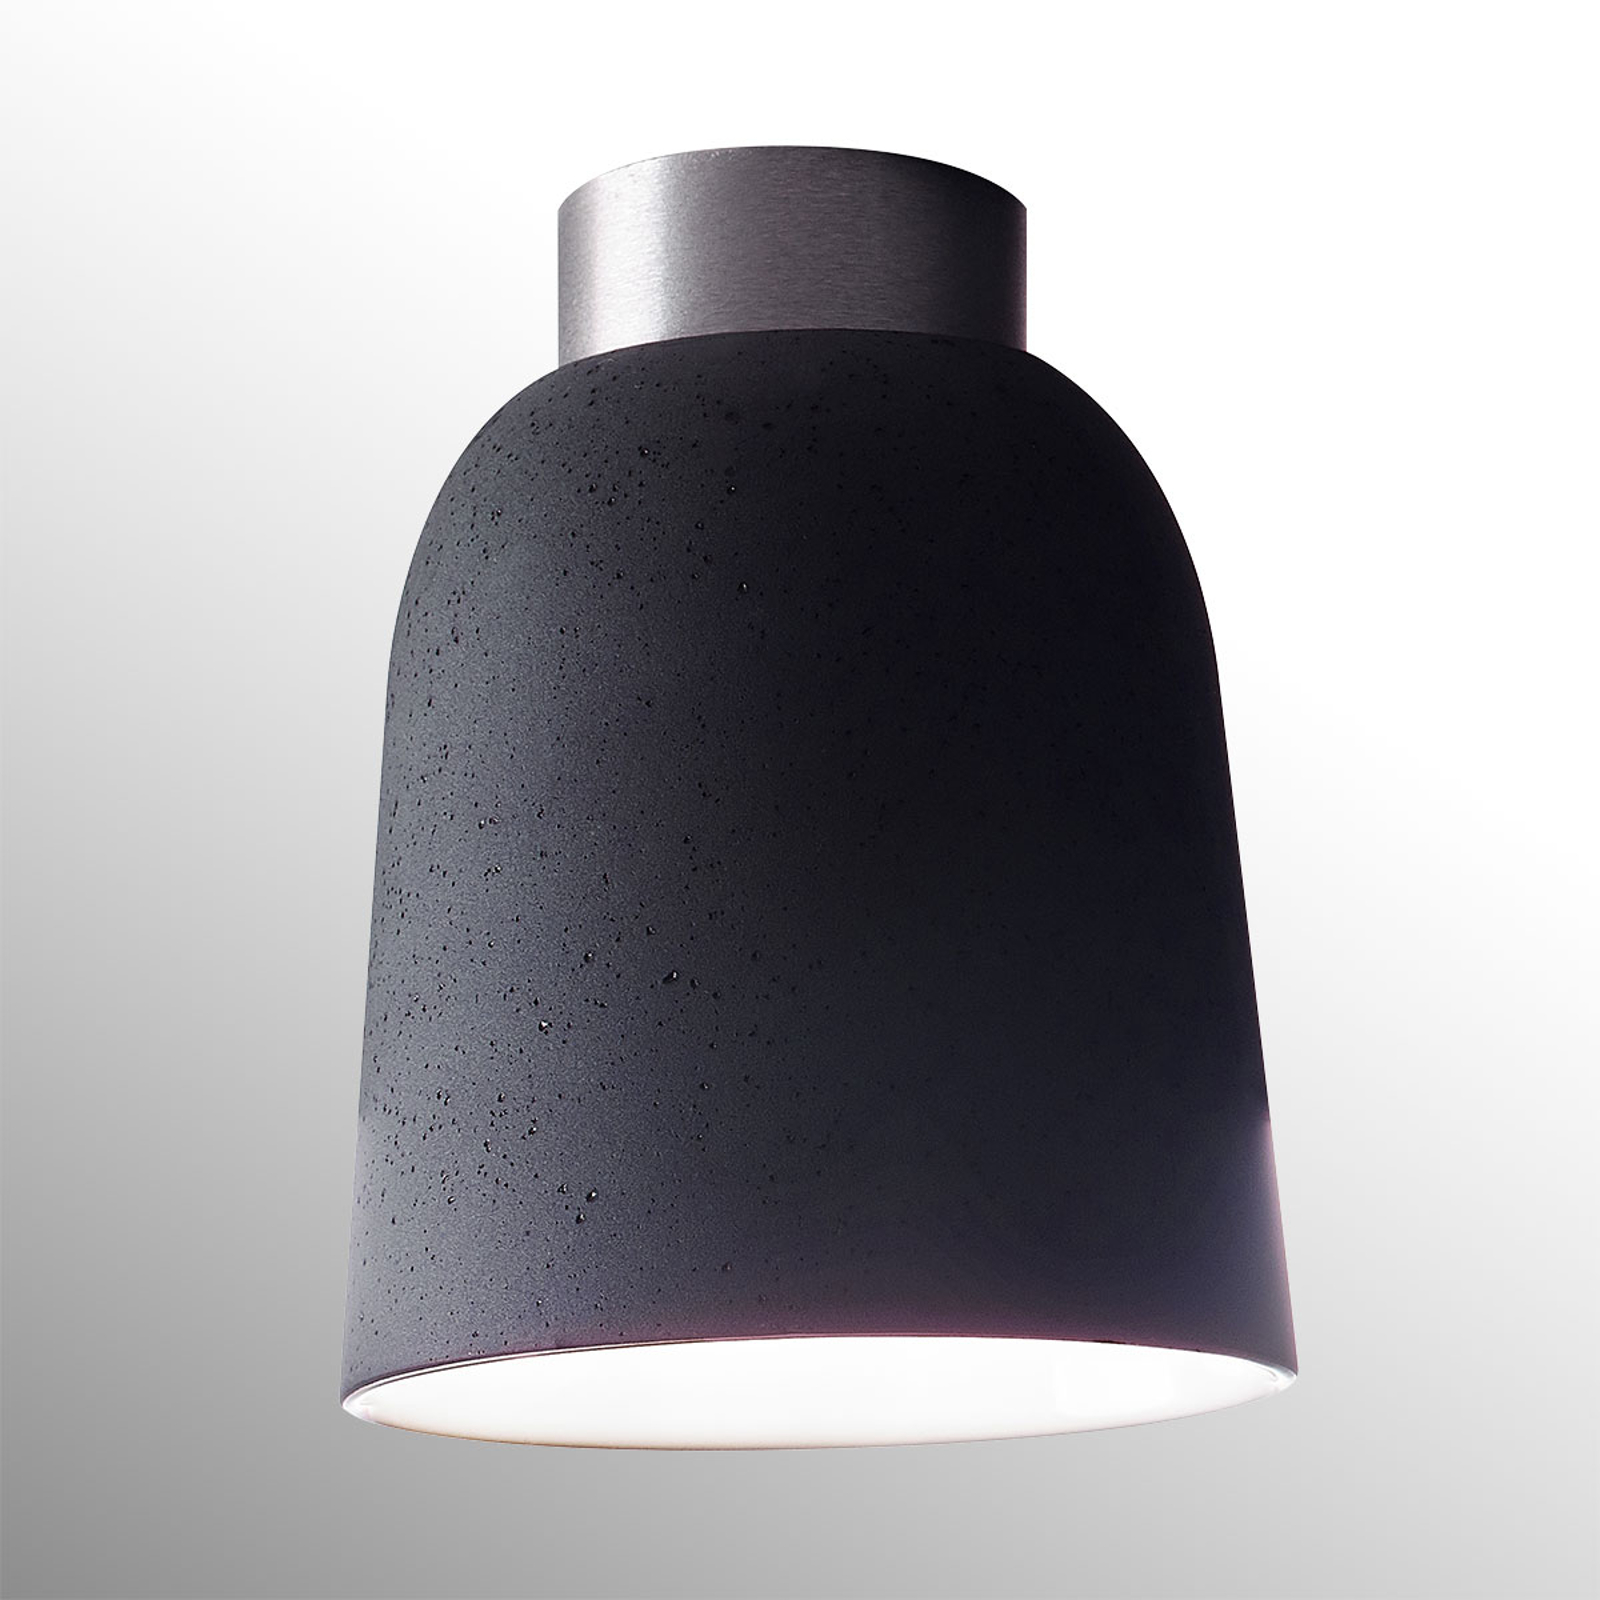 Casablanca Clavio ceramiczna lampa sufitowa, szara